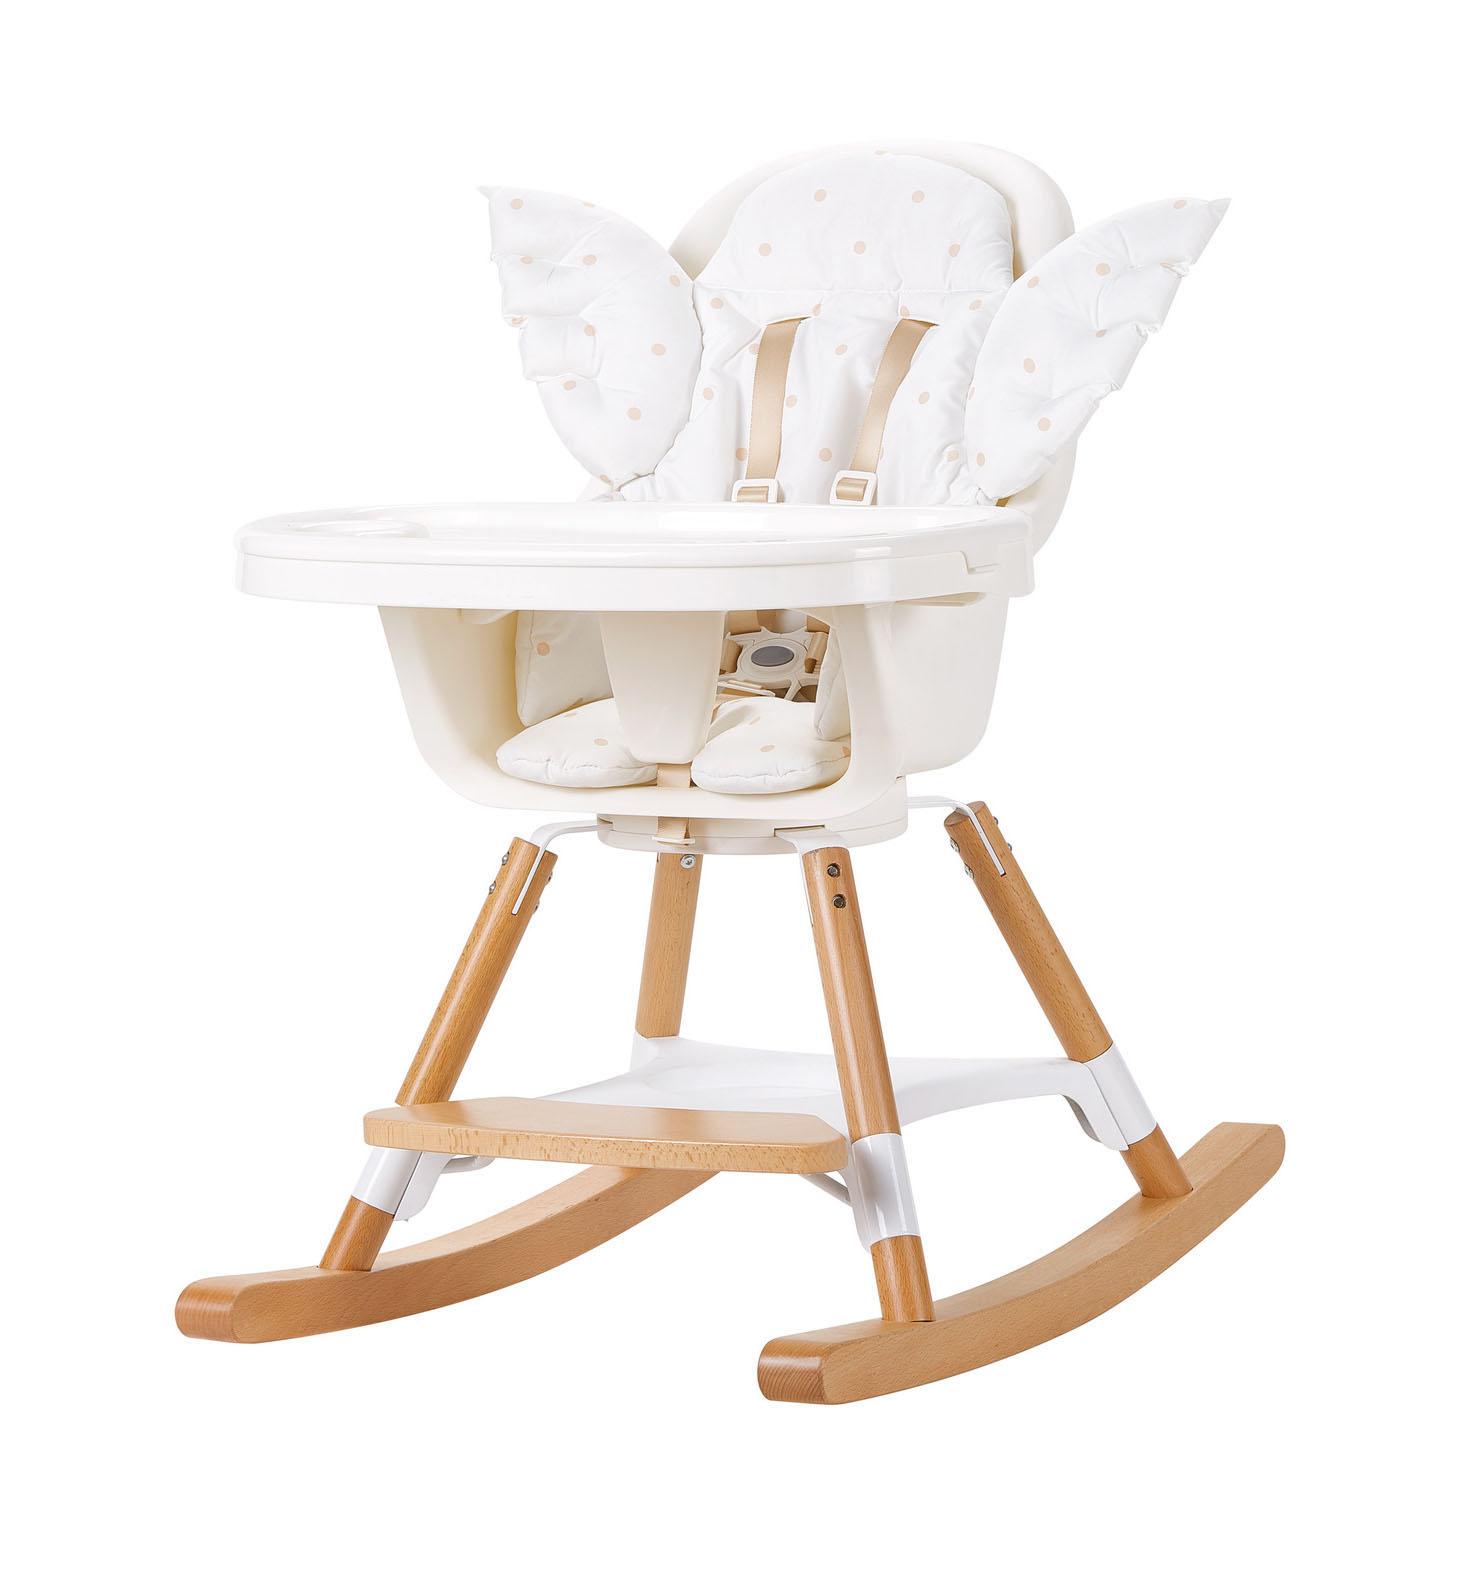 Harari Baby Array image58